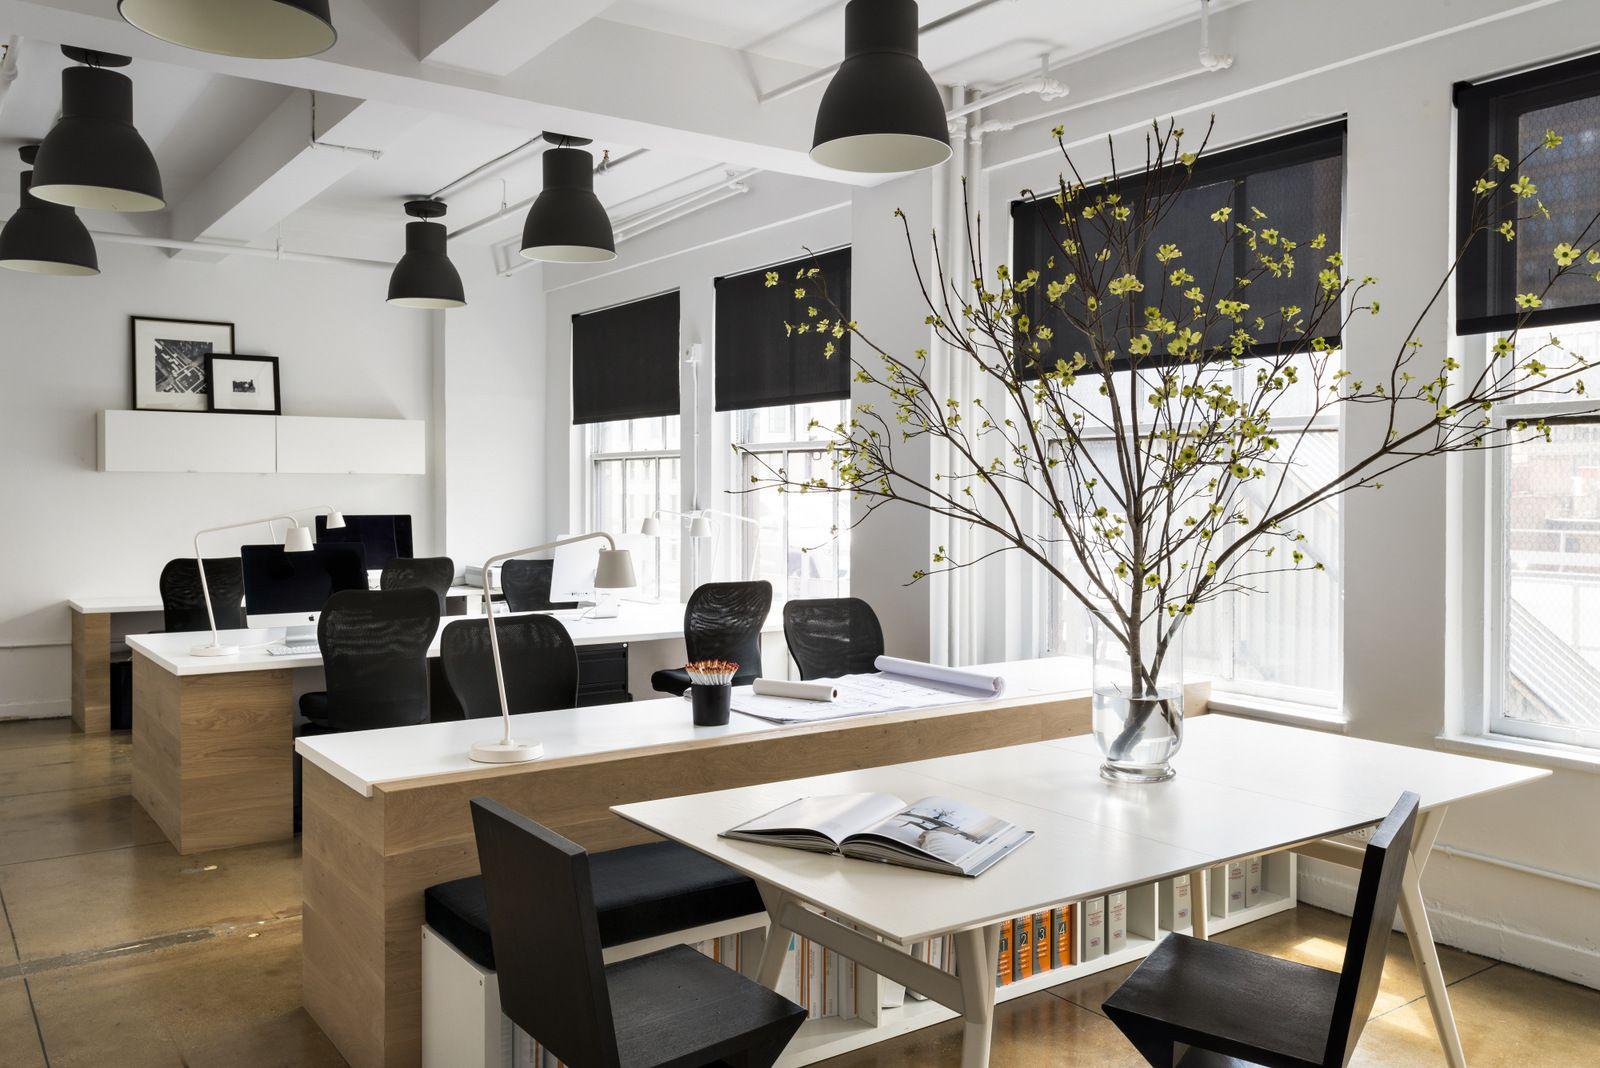 Office Tour: BHDM Design – New York City Offices | Büros, Erfurt und ...